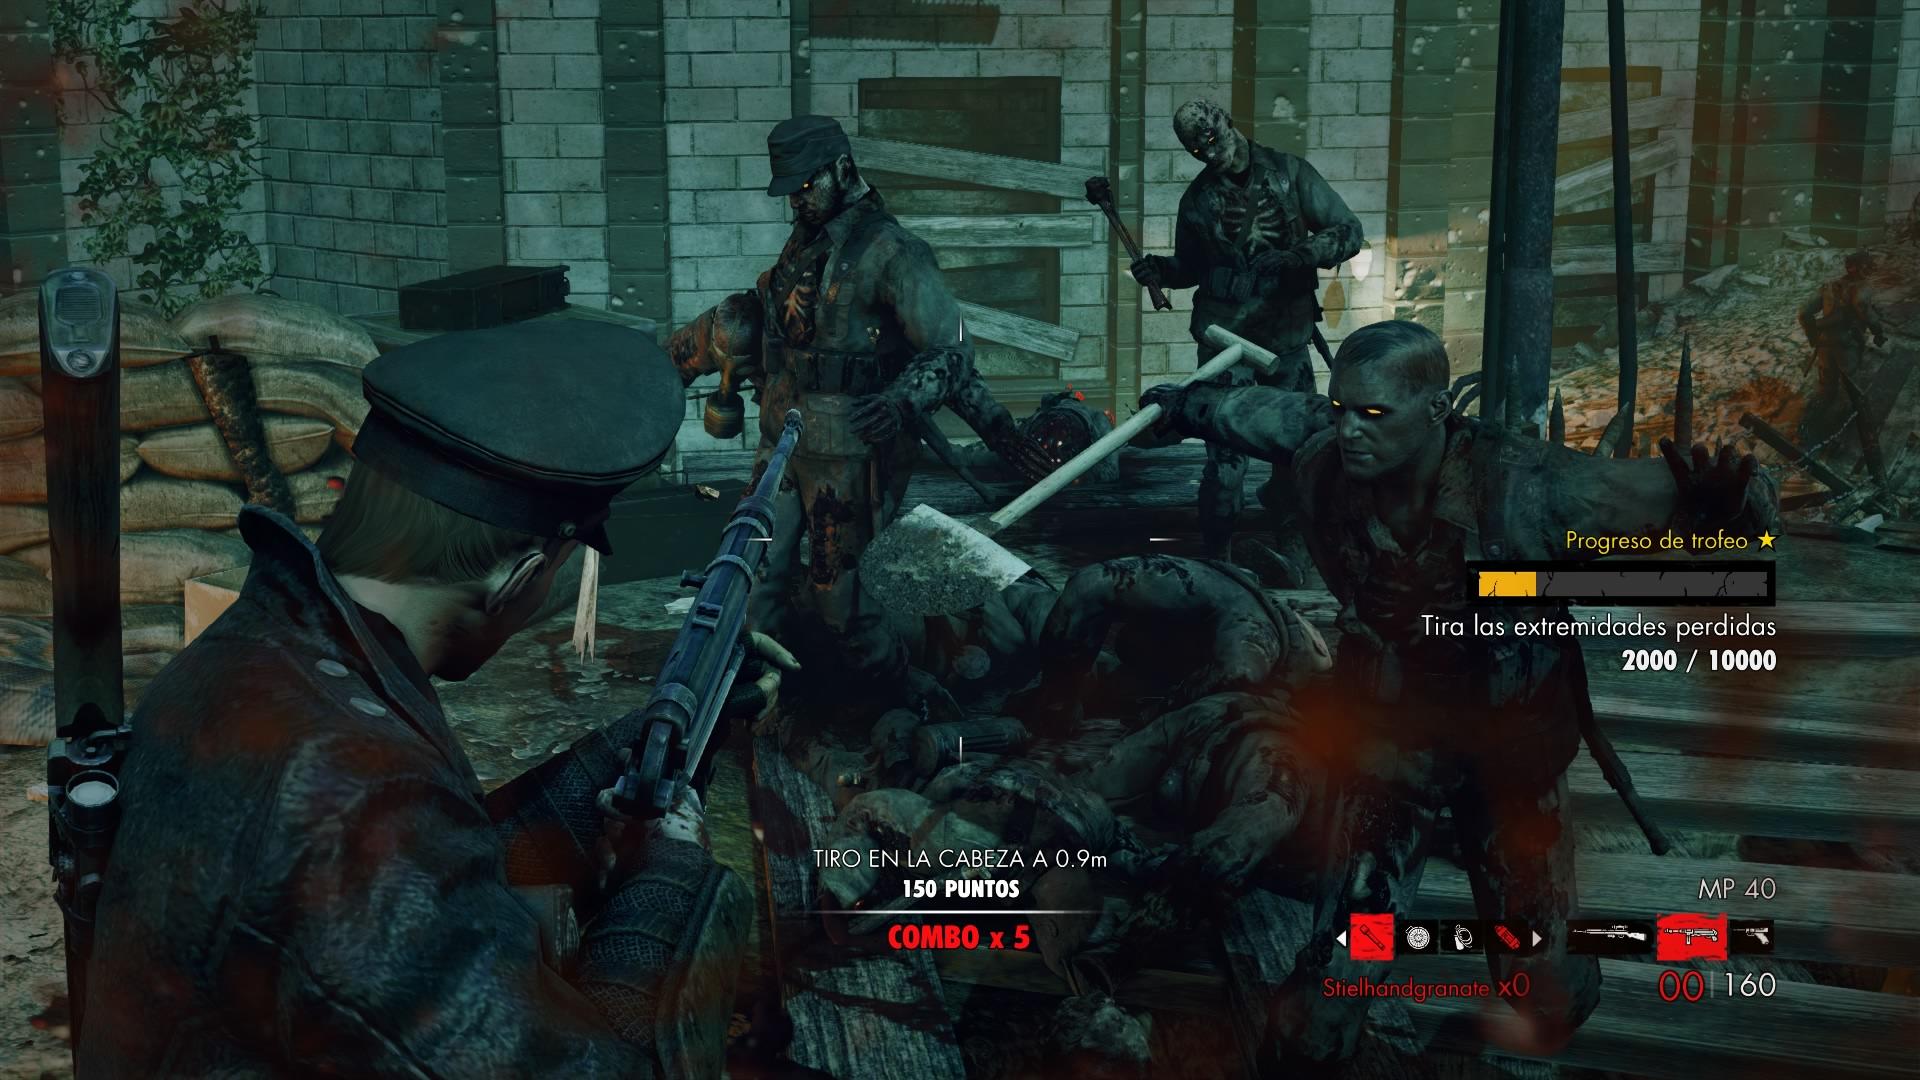 Analisis De Zombie Army Trilogy Hobbyconsolas Juegos